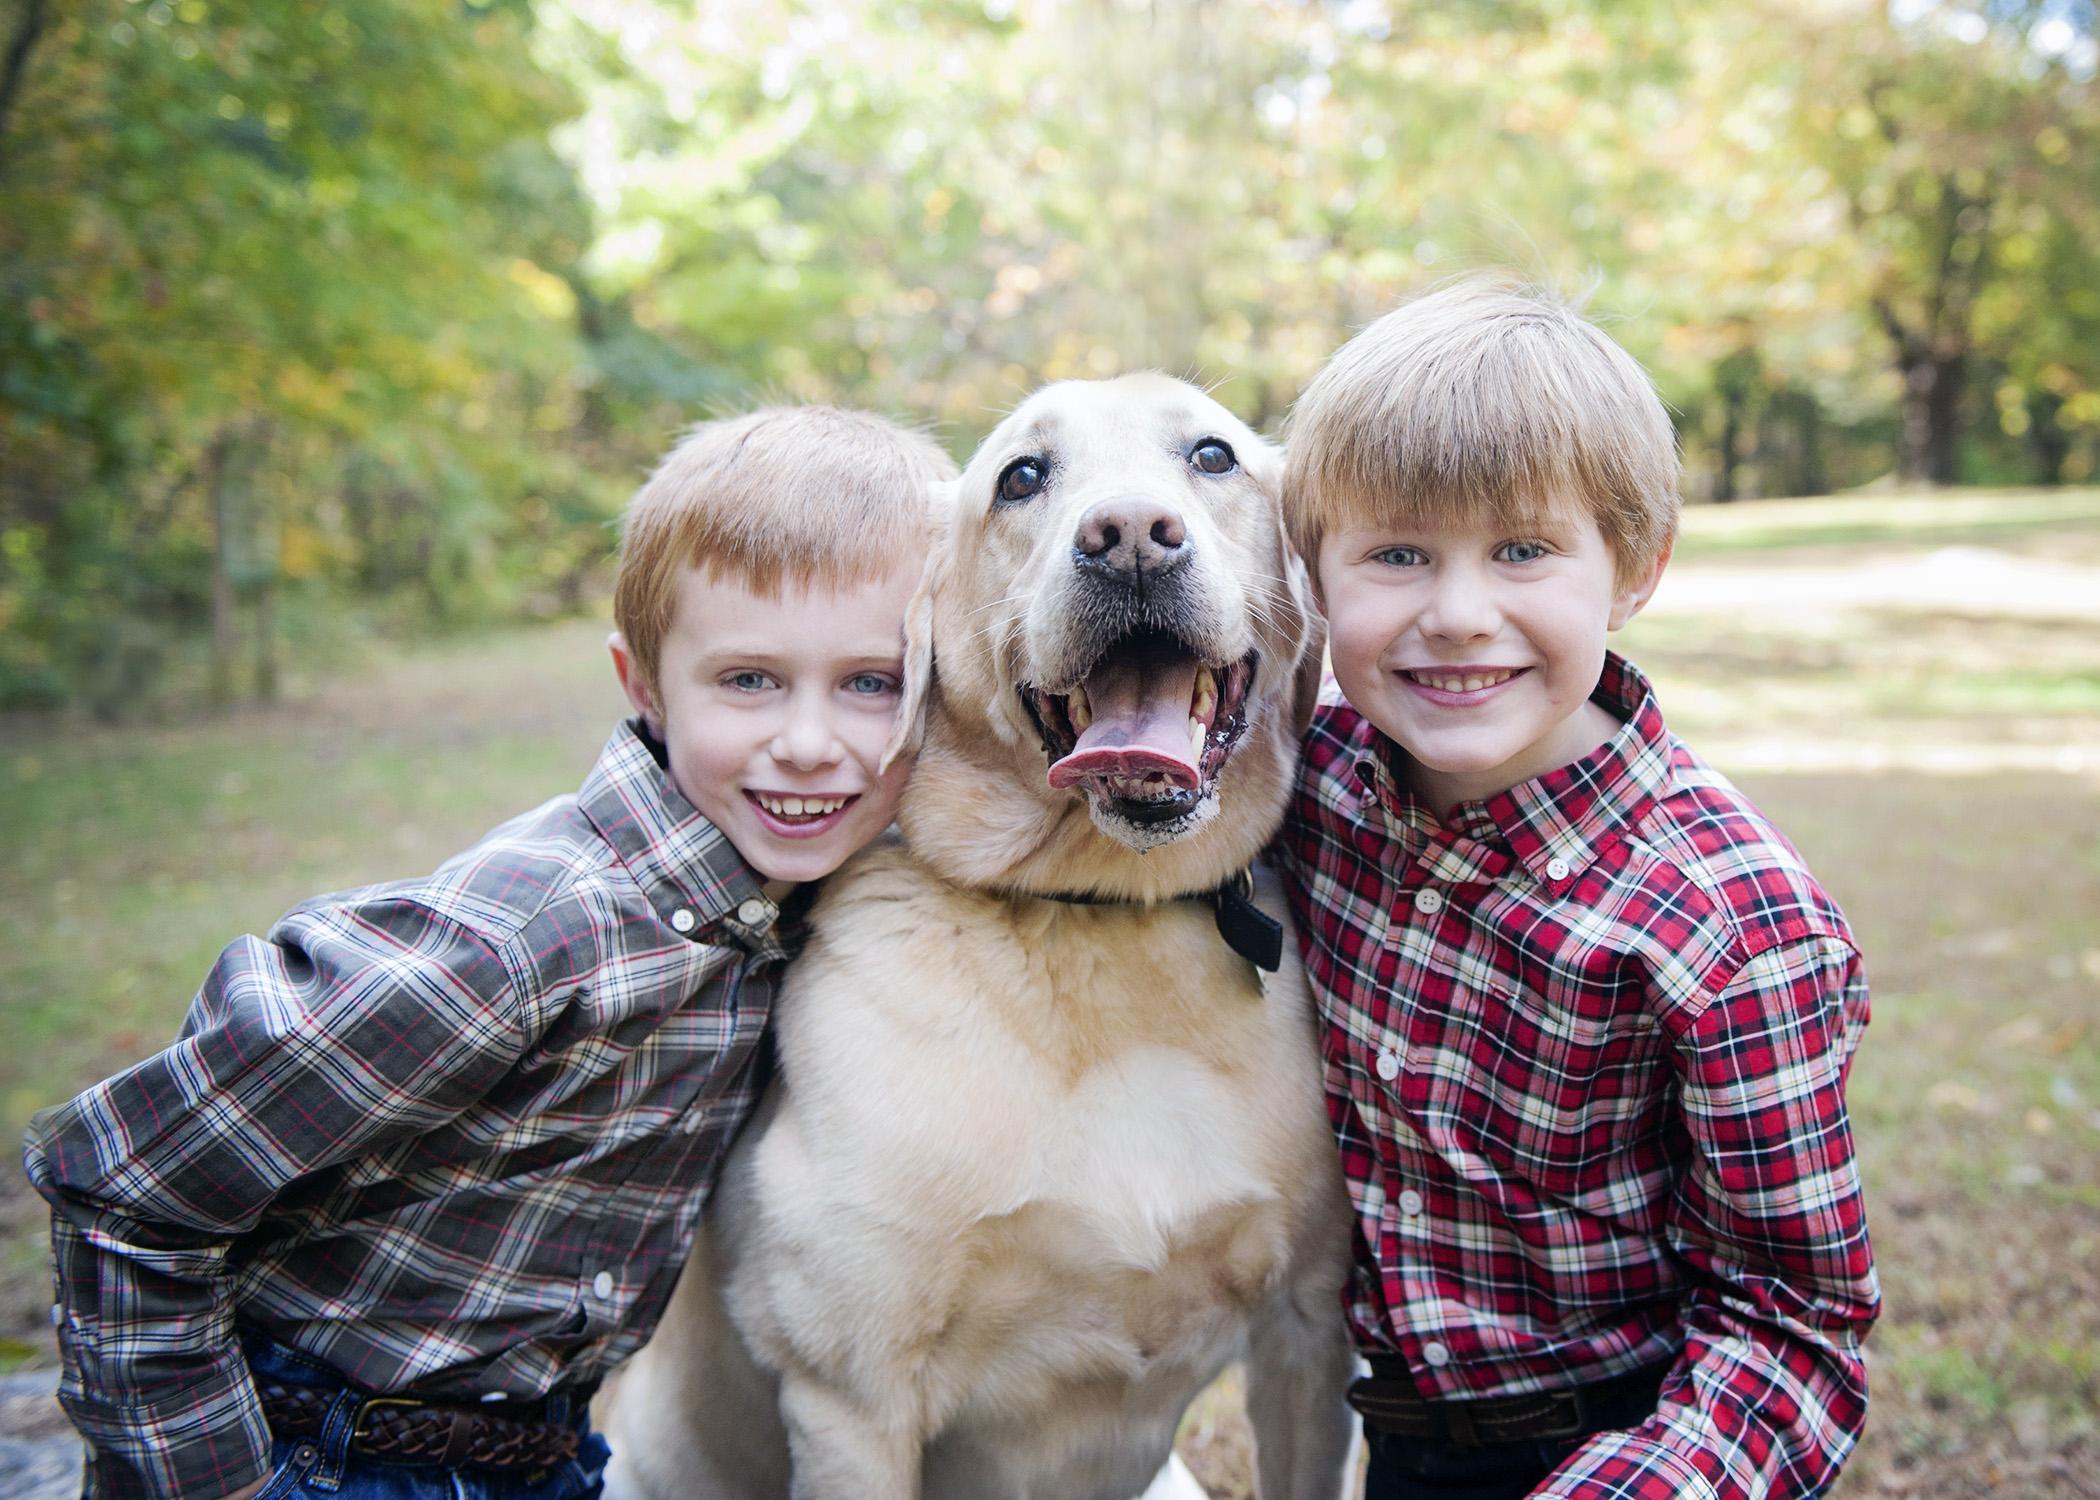 siblings-dog-family-portrait-nina-pomeroy-photographer-danville.jpg